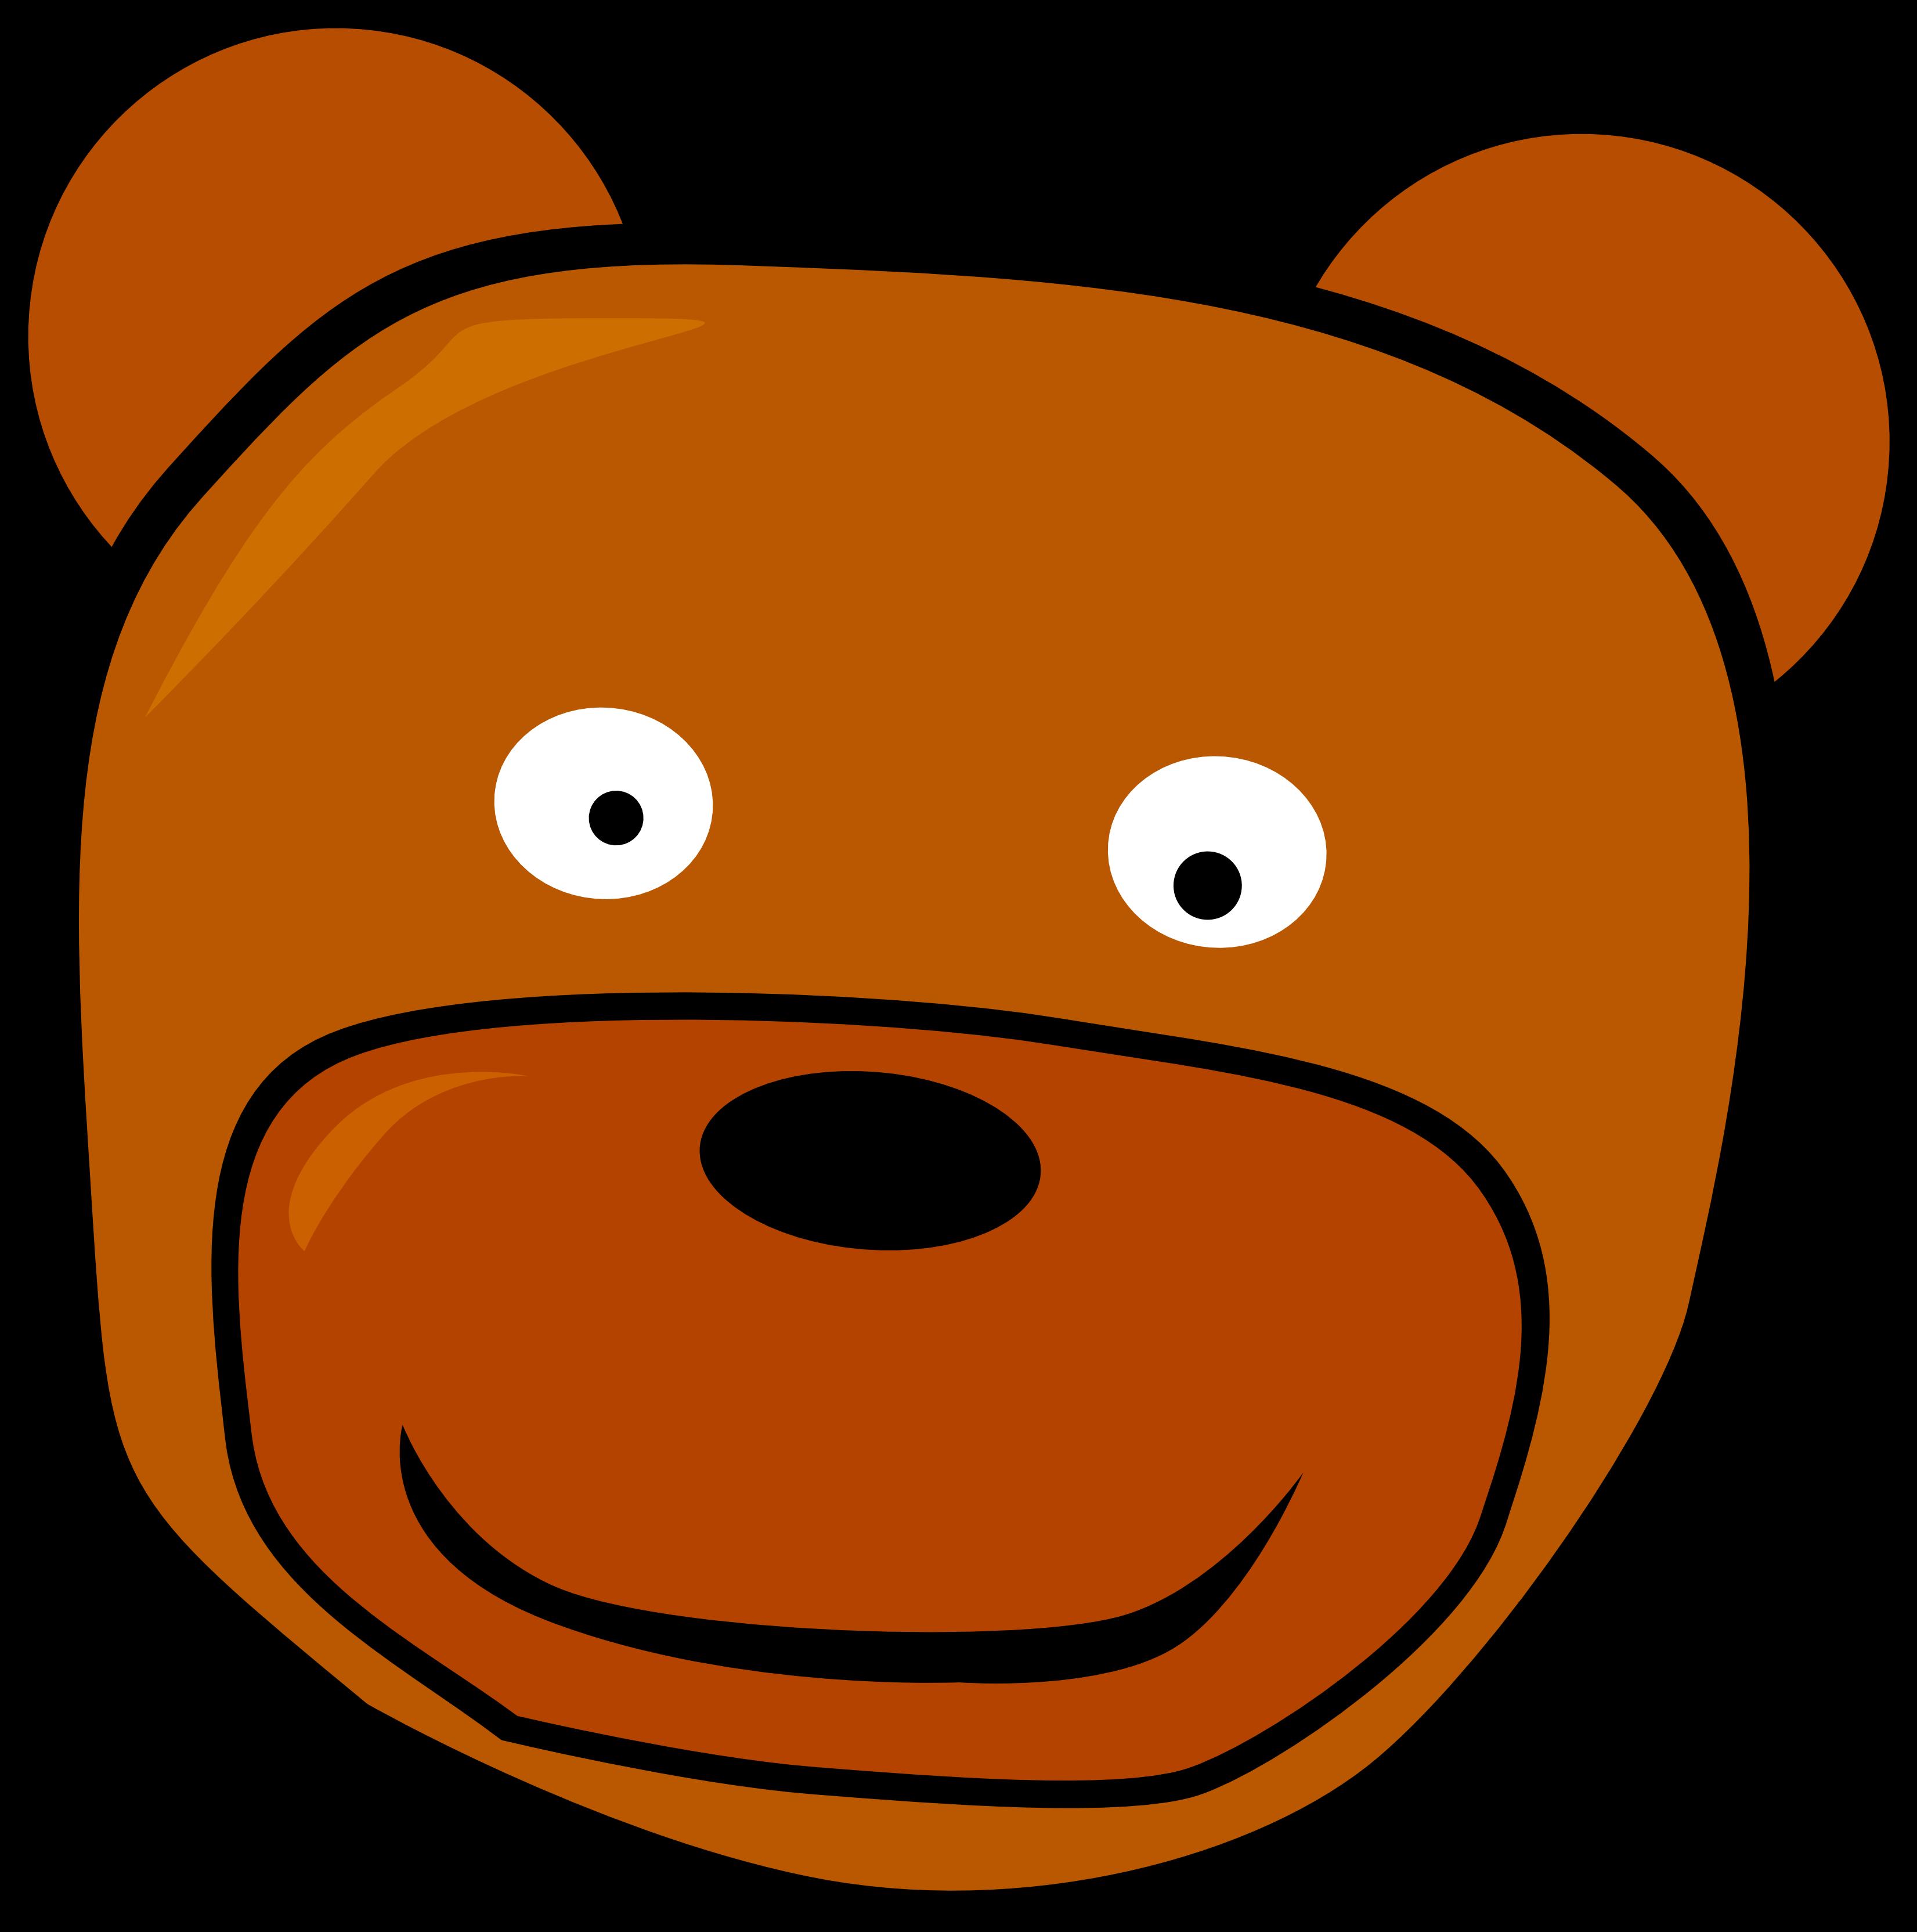 Bear clipart face vector transparent library HD Bear - Clipart Teddy Bear Head Transparent PNG Image Download ... vector transparent library